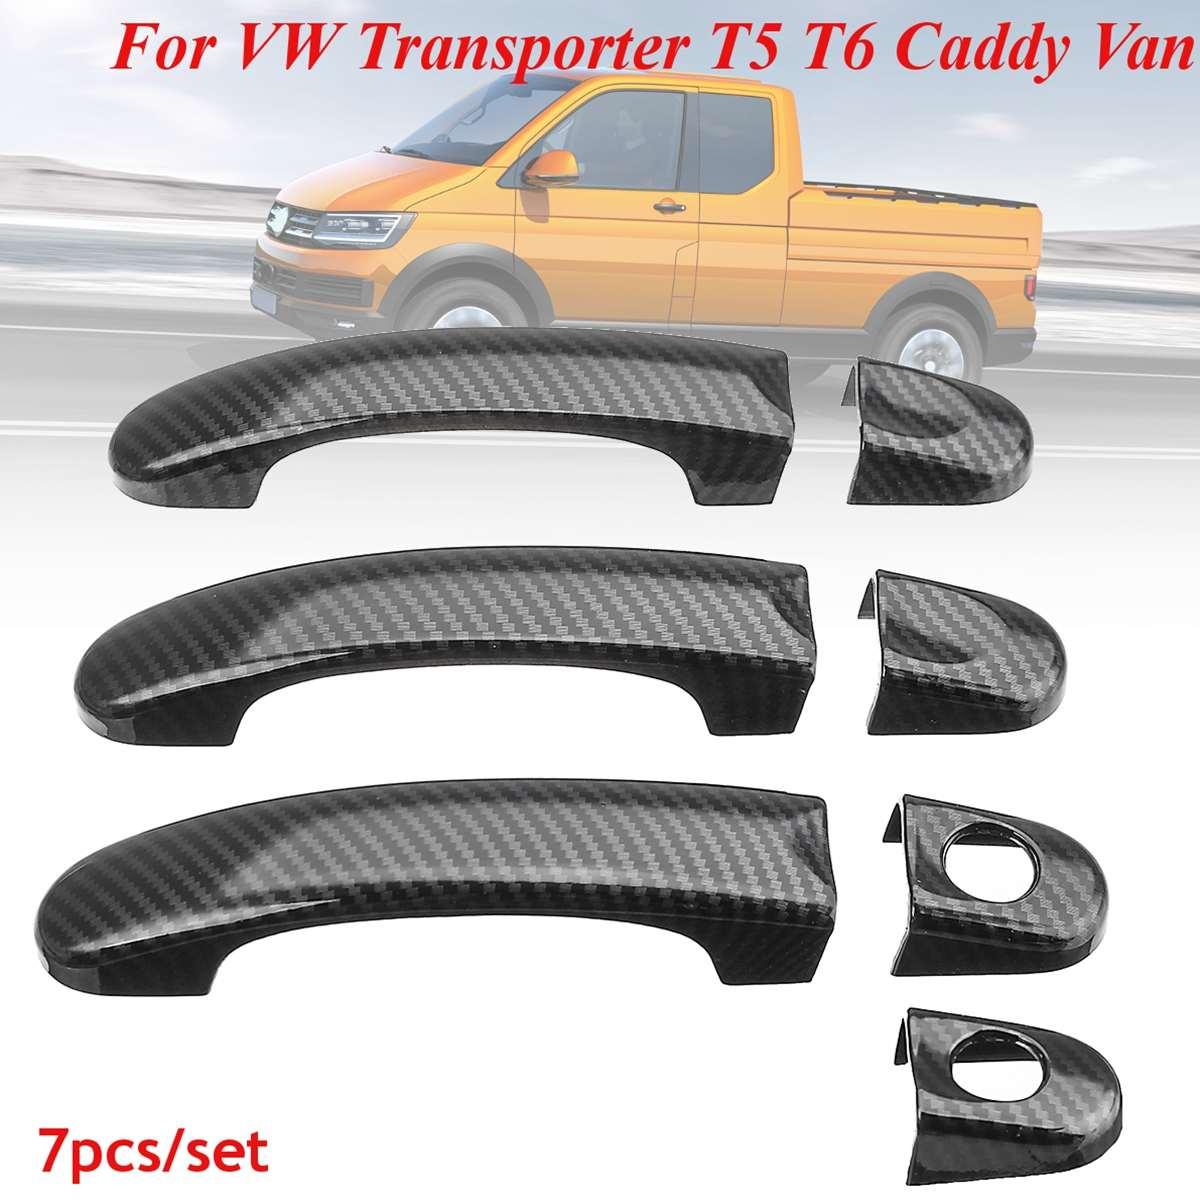 7pcs Set Carbon Fiber Door Handle Covers For VW  For VW Transporter T5 T6 Caddy for Vans 2004 05 06 07 08 09 10 11 12